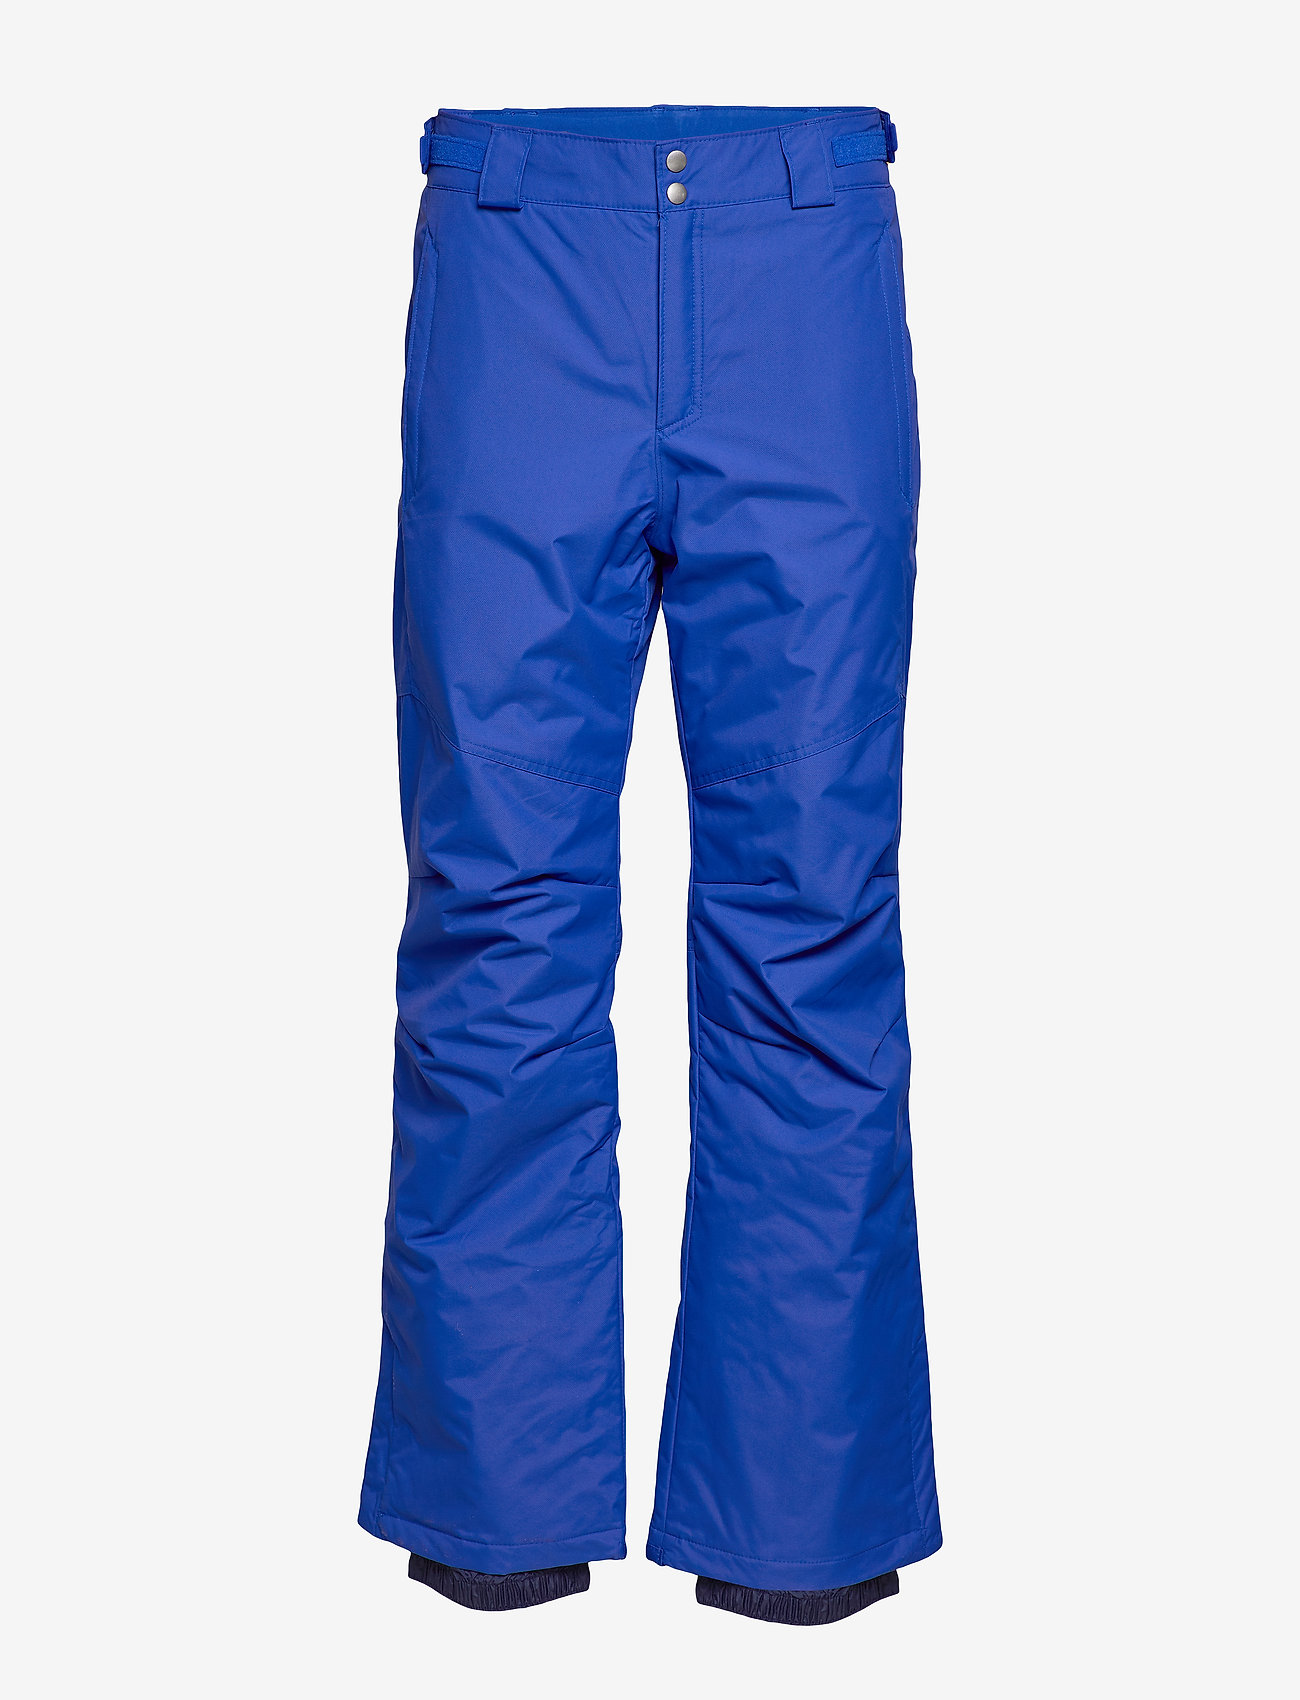 Columbia - Bugaboo IV Pant - spodnie narciarskie - azul - 0